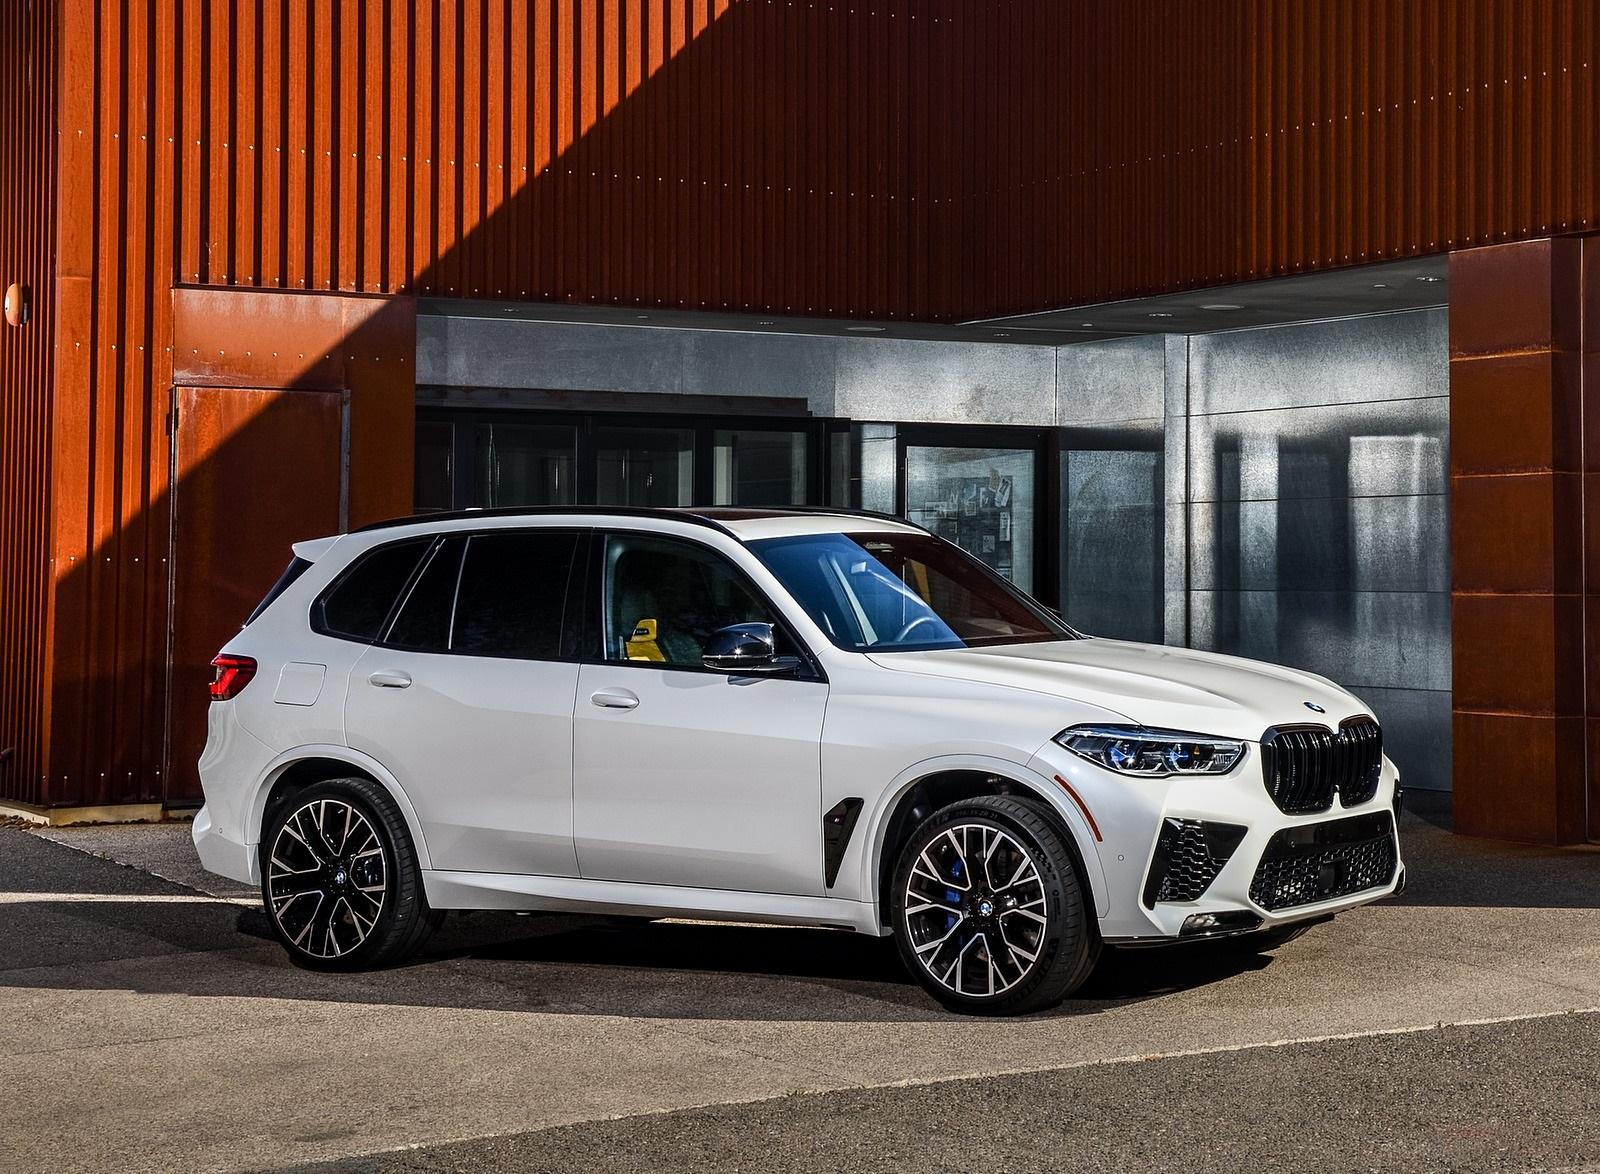 2020 BMW X5 M Competition Color Mineral White US Spec Front Three Quarter Wallpaper - Seberapa Mewah BMW Rp 1.7 Miliar Milik Jaksa Pinangki